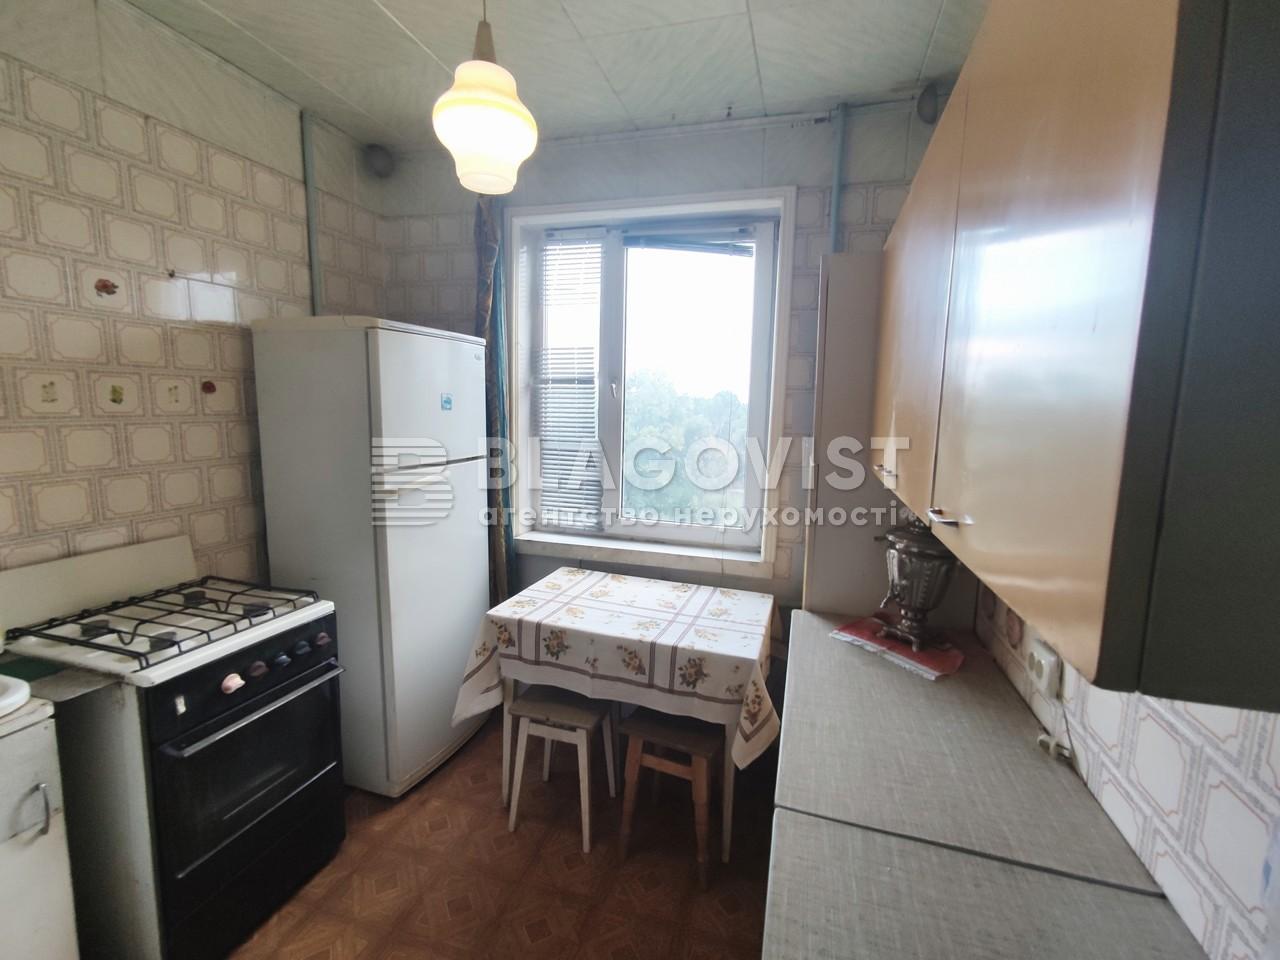 Квартира Z-807904, Приречная, 17, Киев - Фото 10